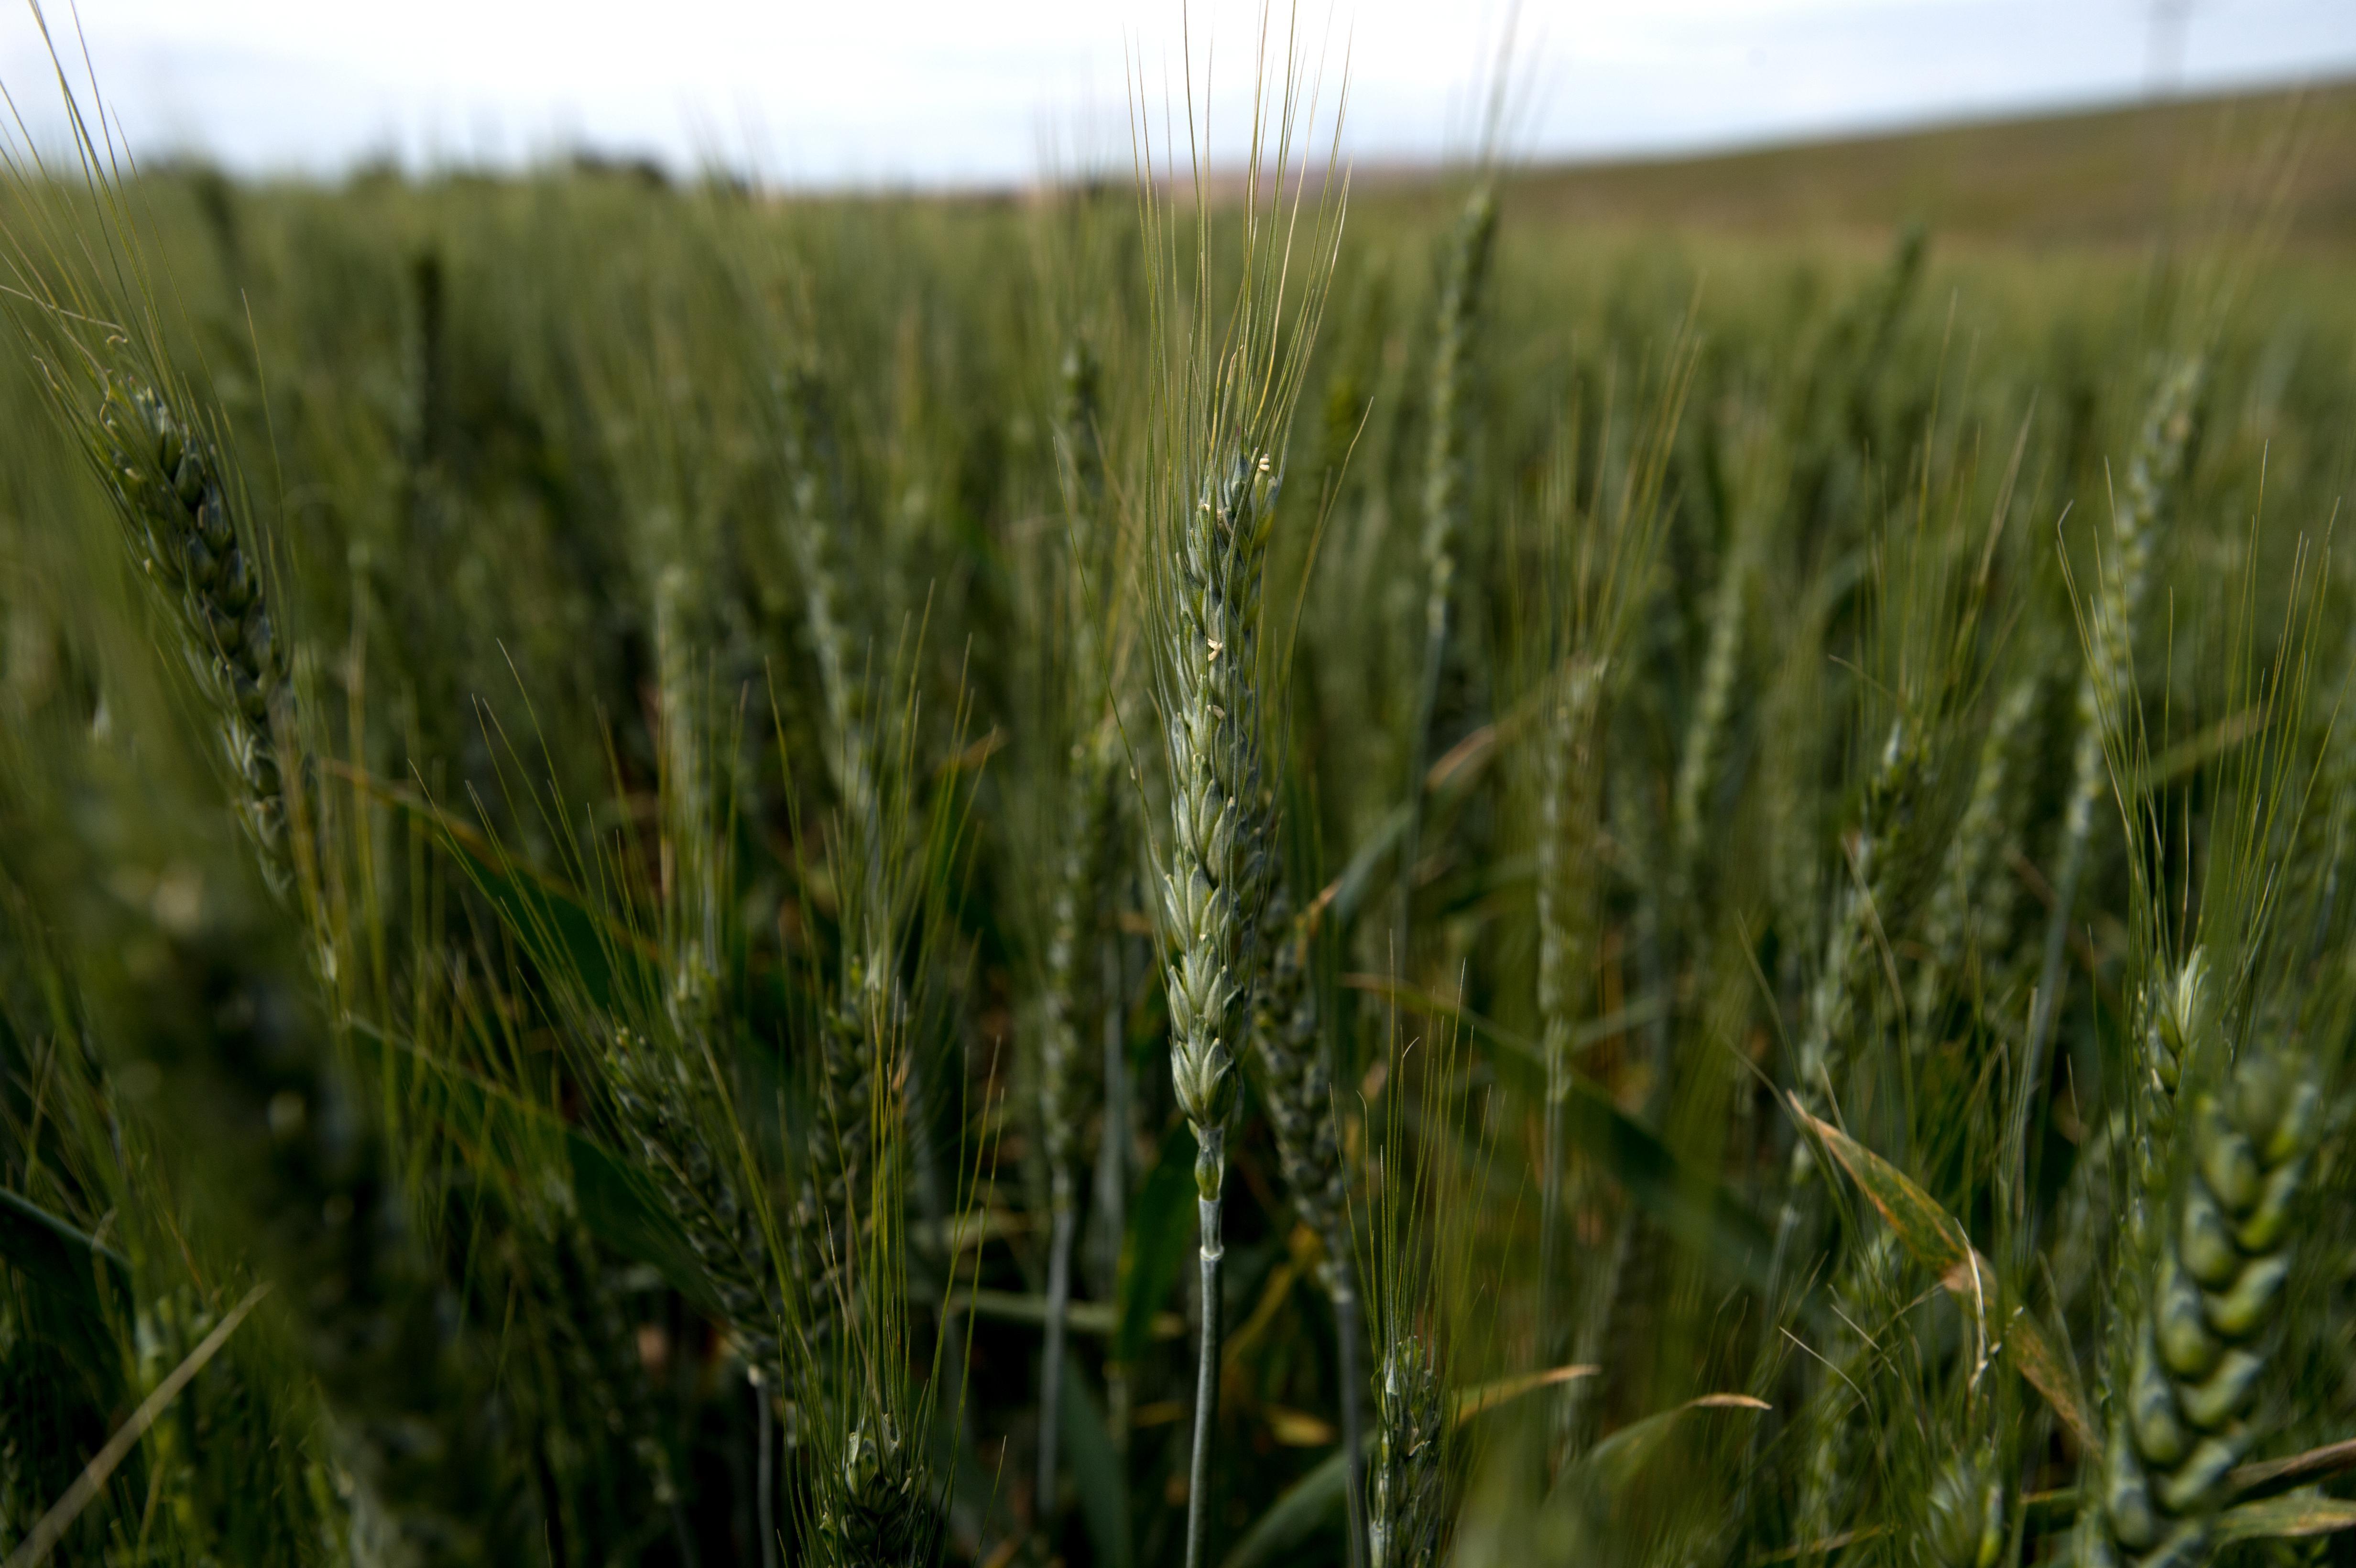 The world of wheat: Growing grain in Washington | The